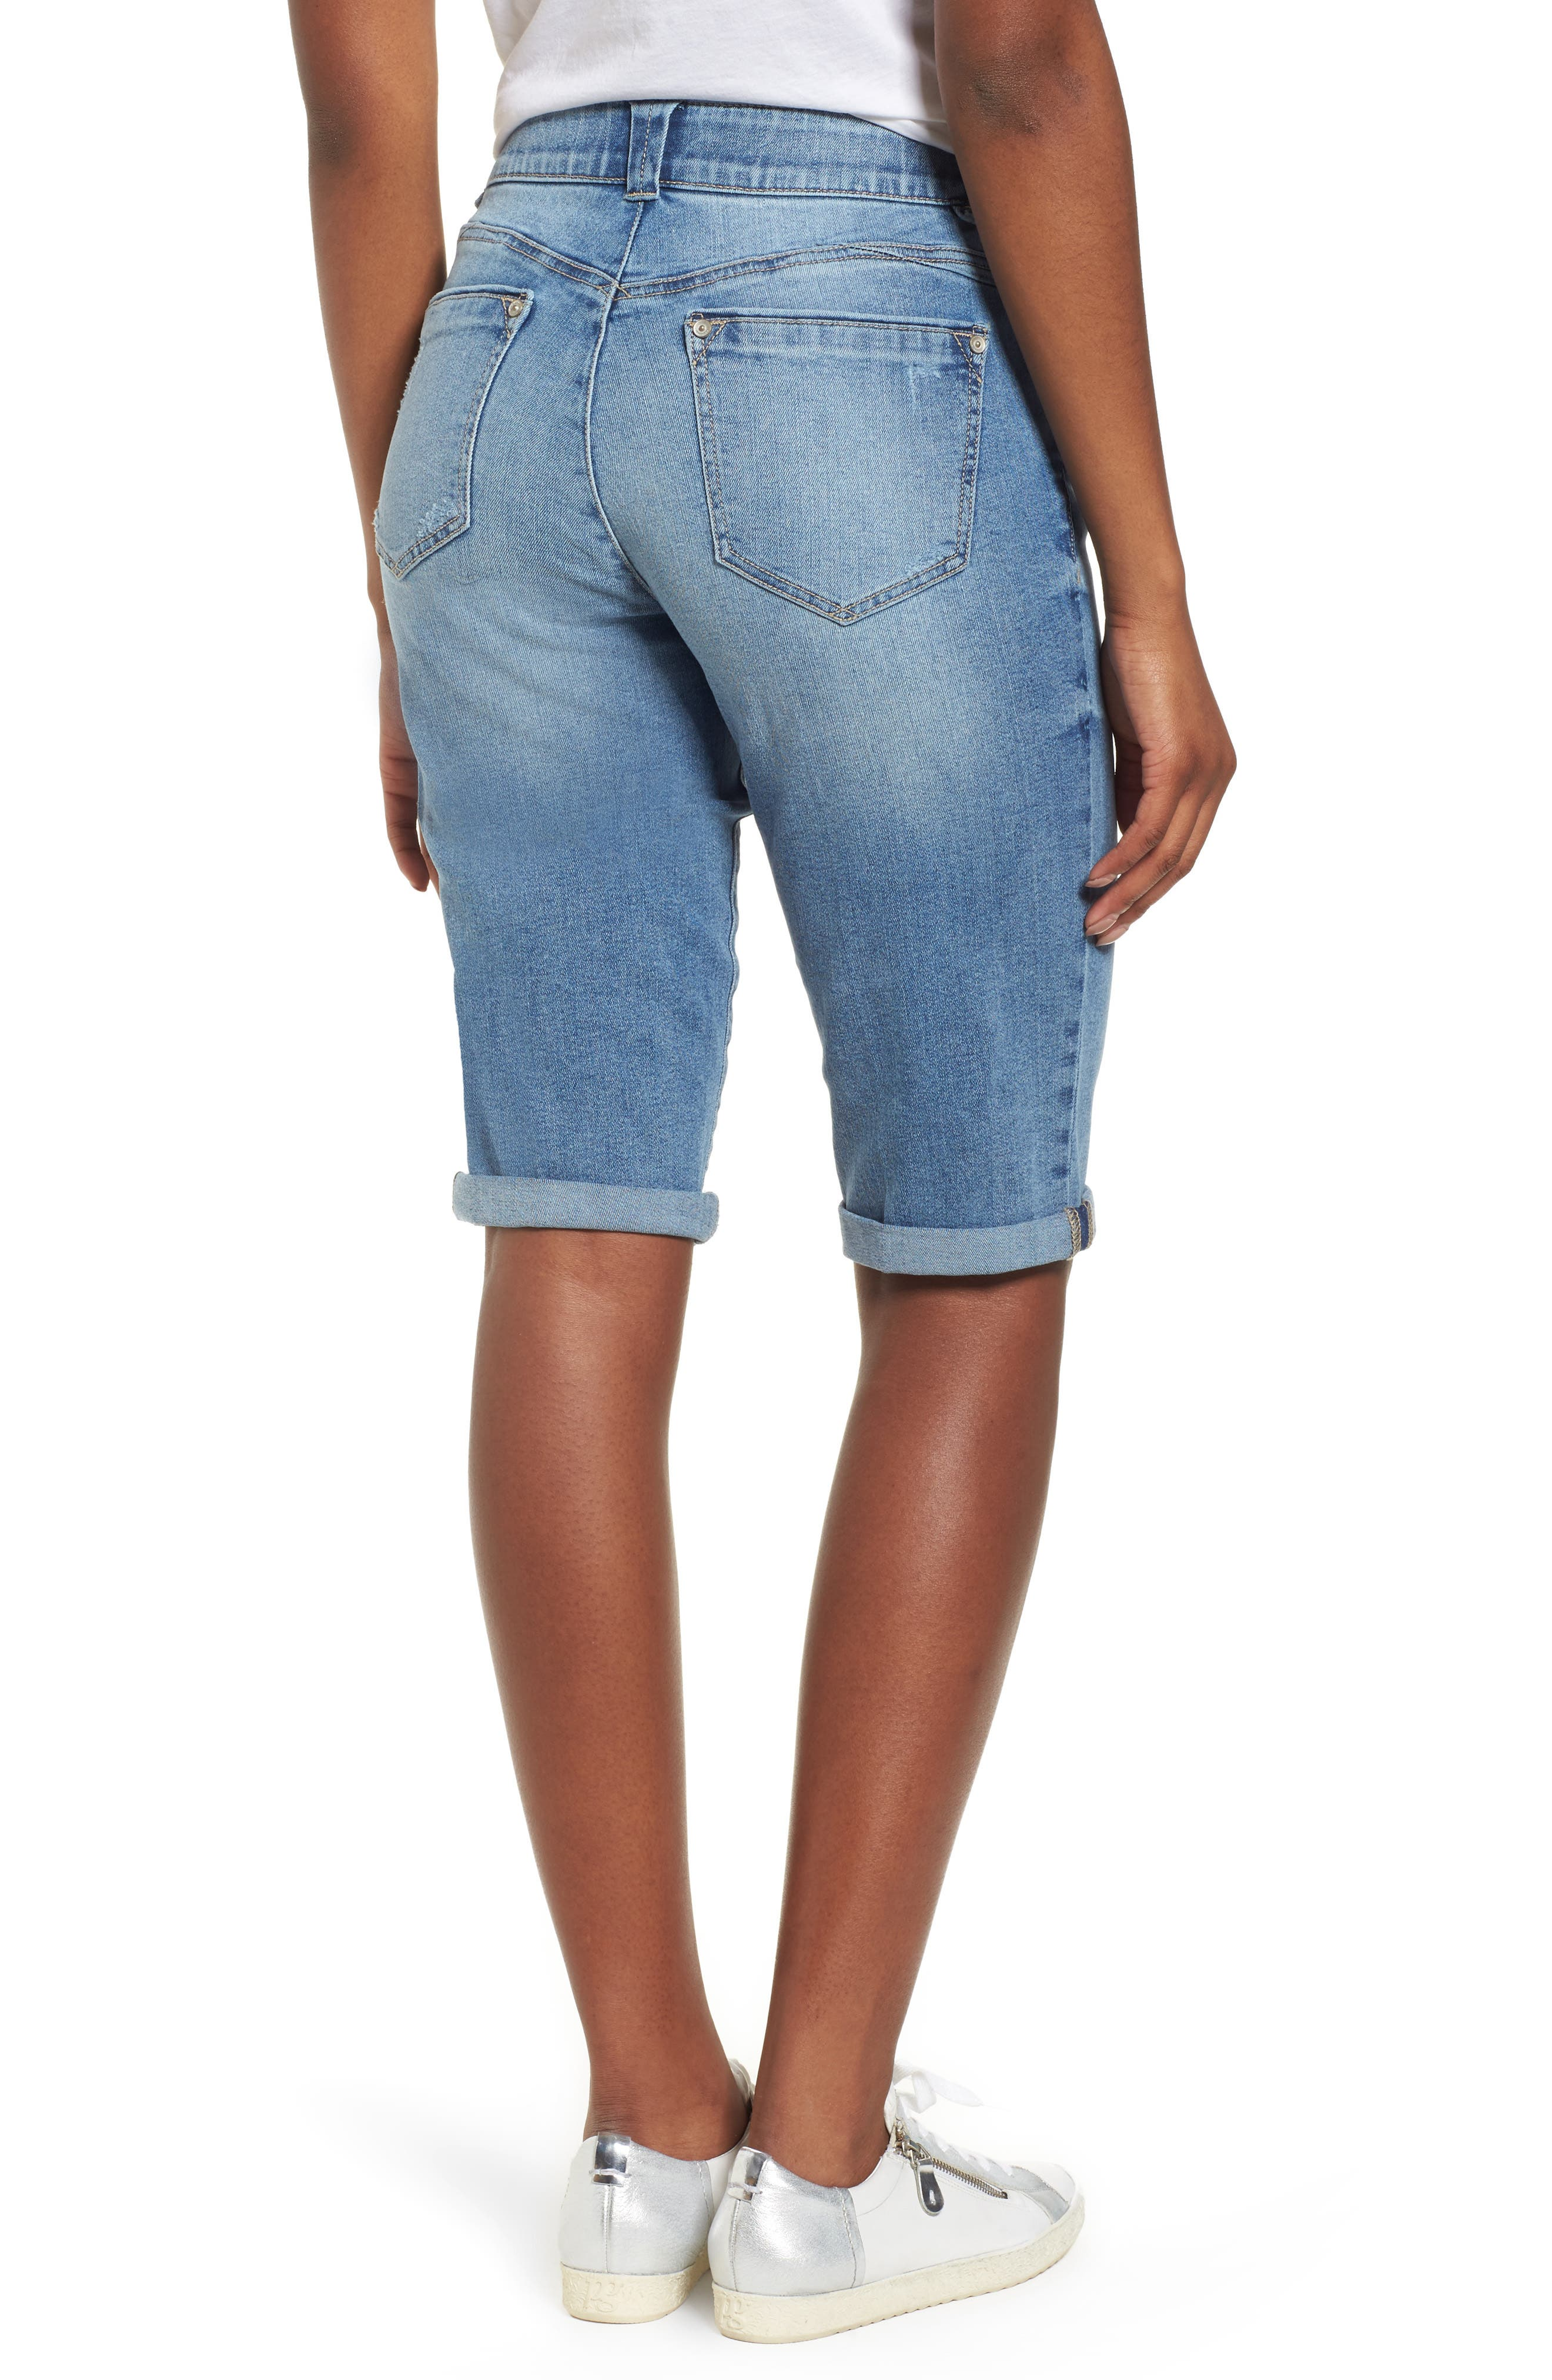 Ab-solution Cuffed Denim Shorts,                             Alternate thumbnail 2, color,                             Light Blue